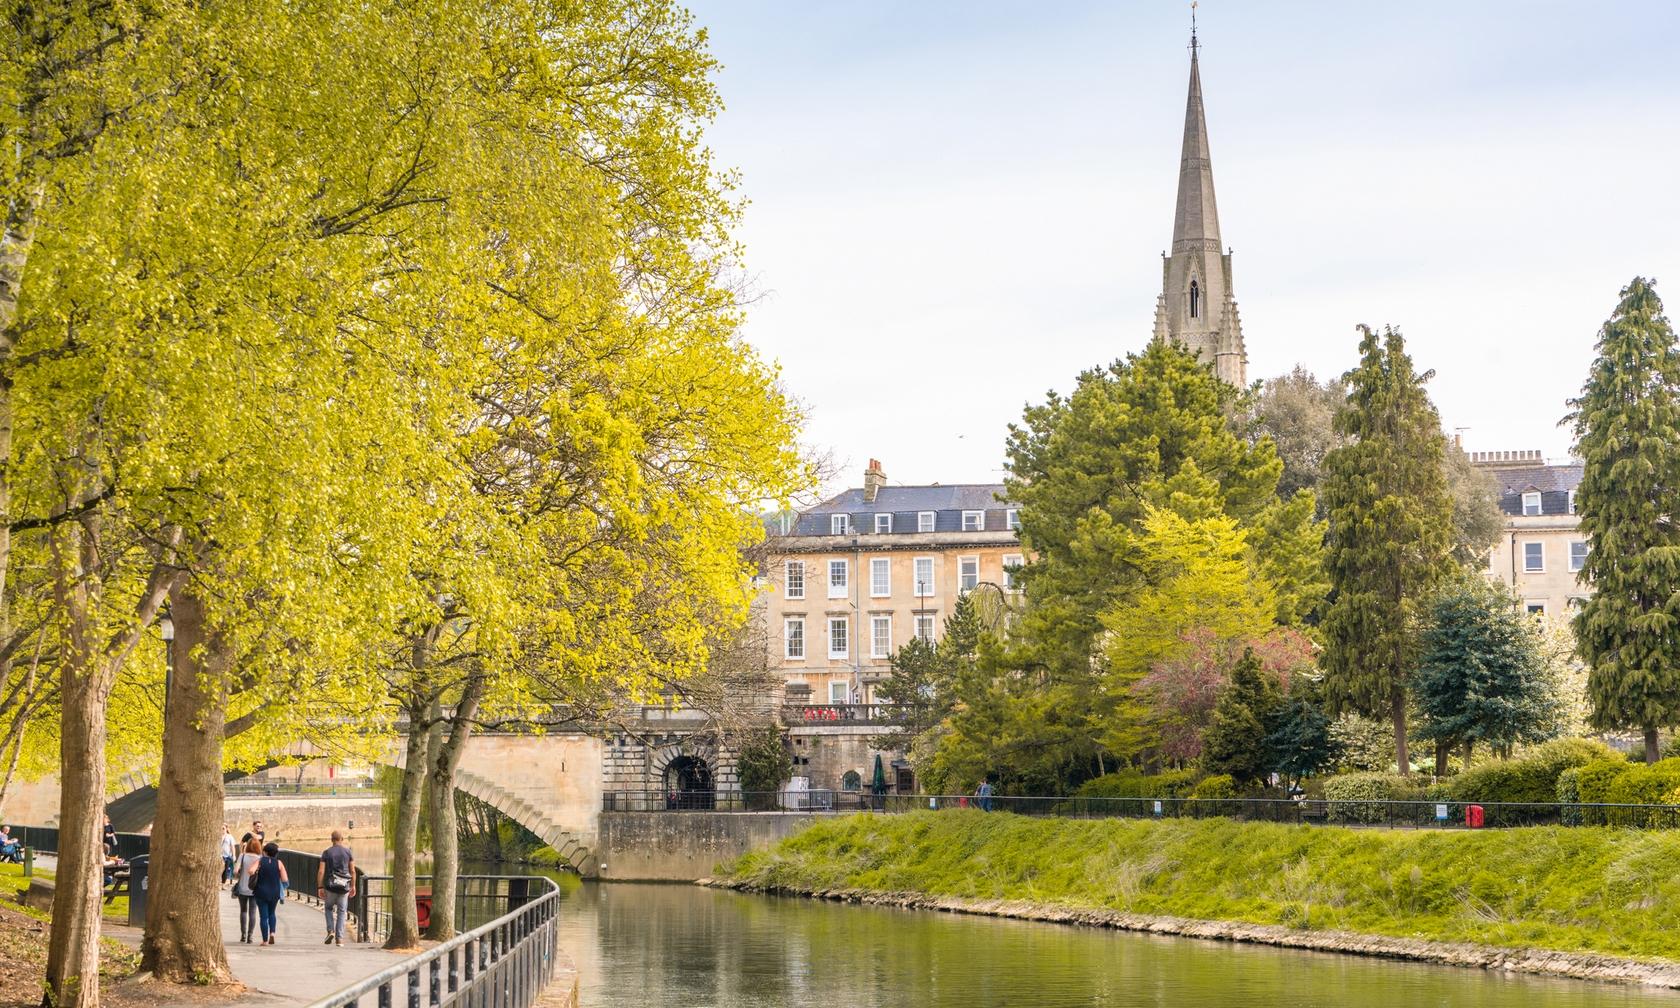 Holiday rental apartments in Bath